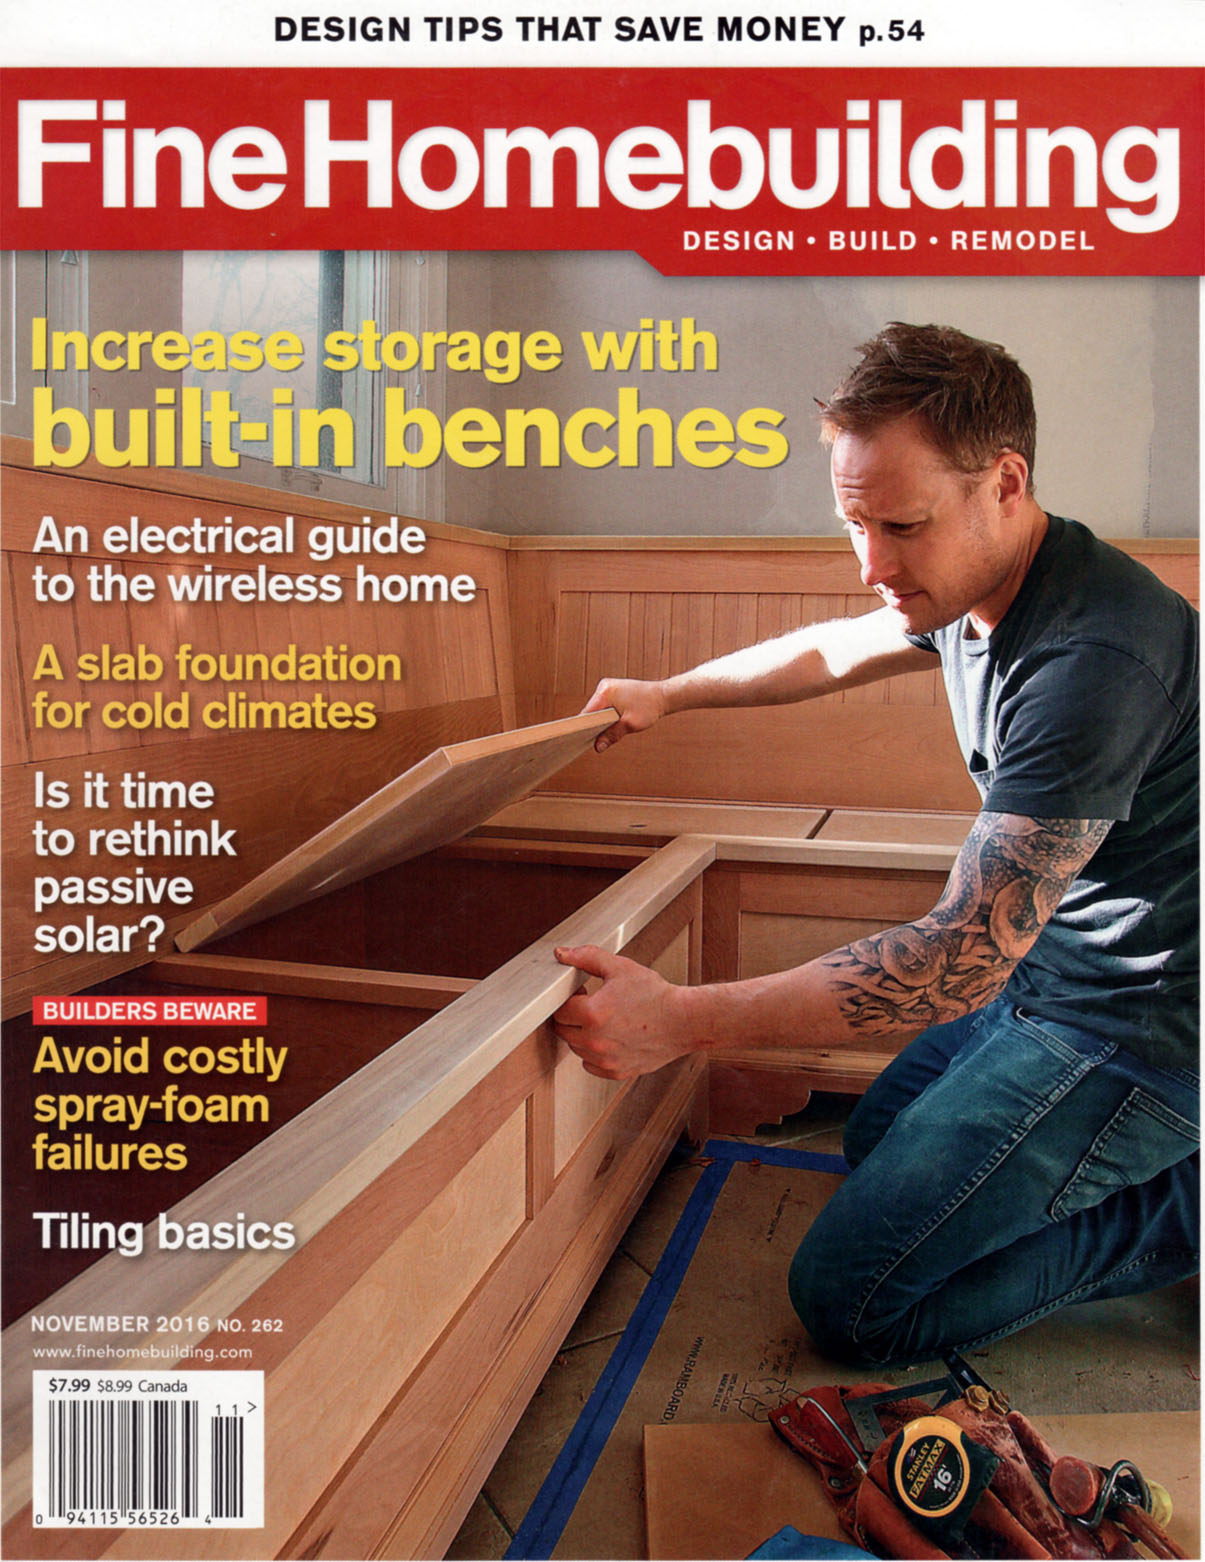 Fine Homebuilding November 2016 DXV Design Panel 2016-2017 Charleston Classic